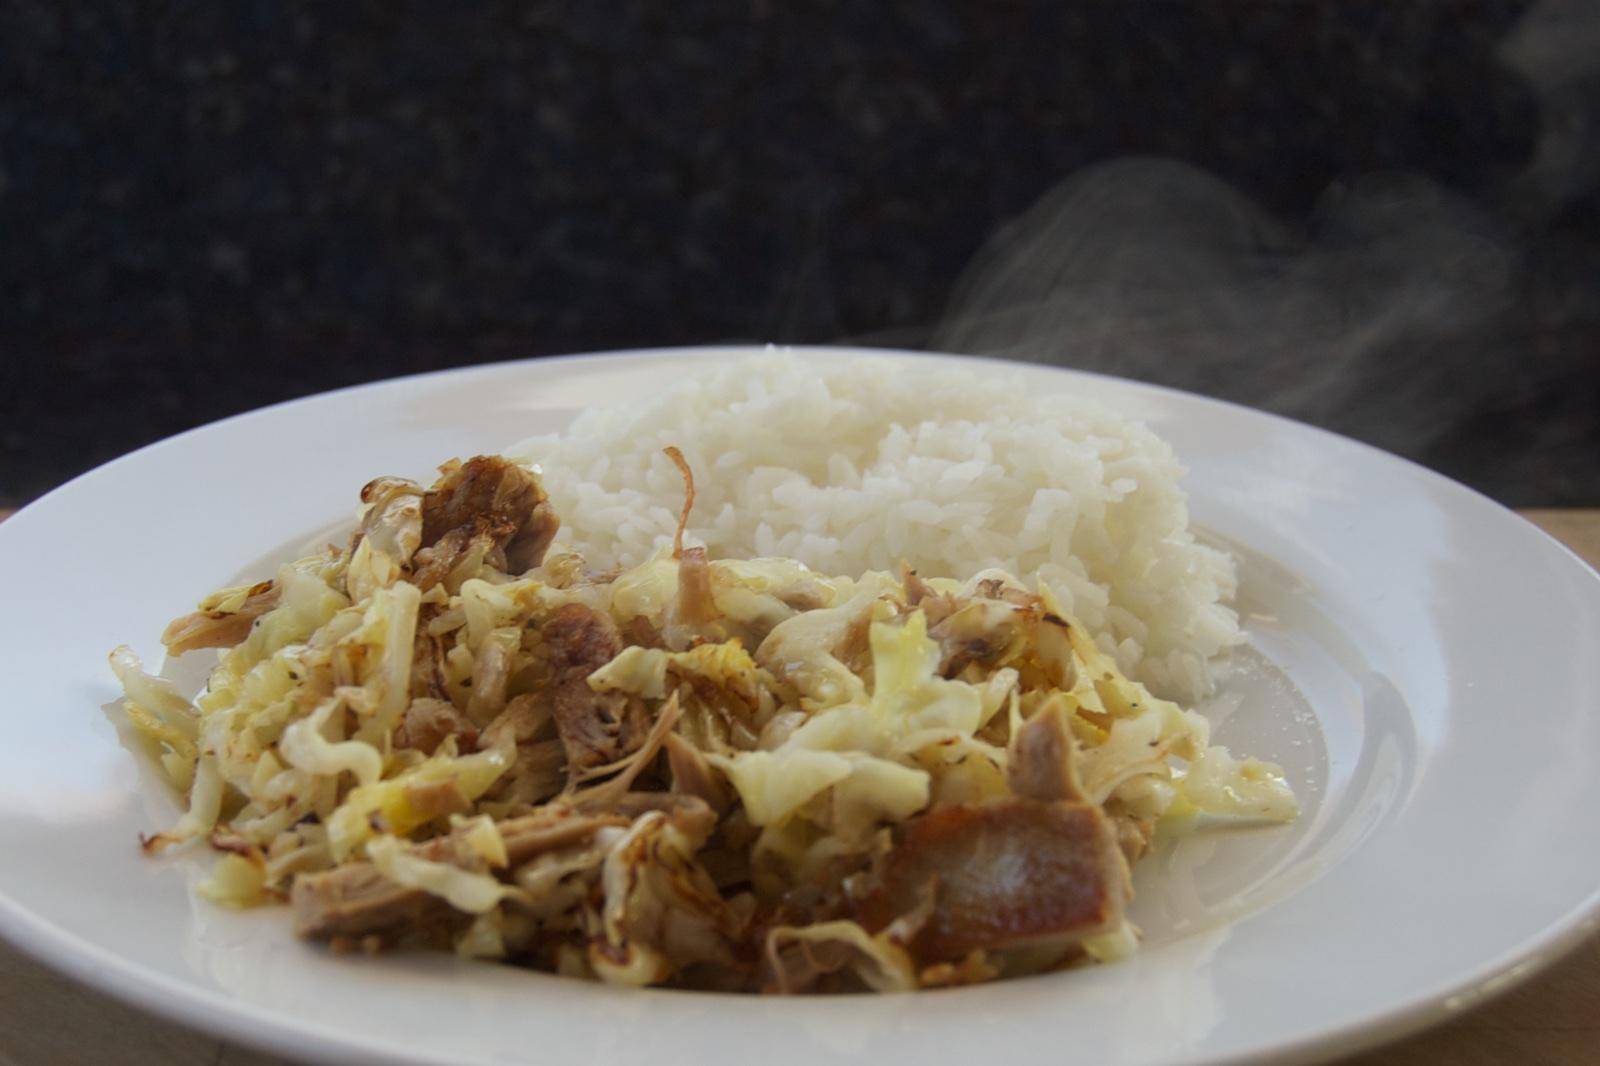 http://blog.rickk.com/food/2015/01/15/ate.2015.01.15.l.jpg